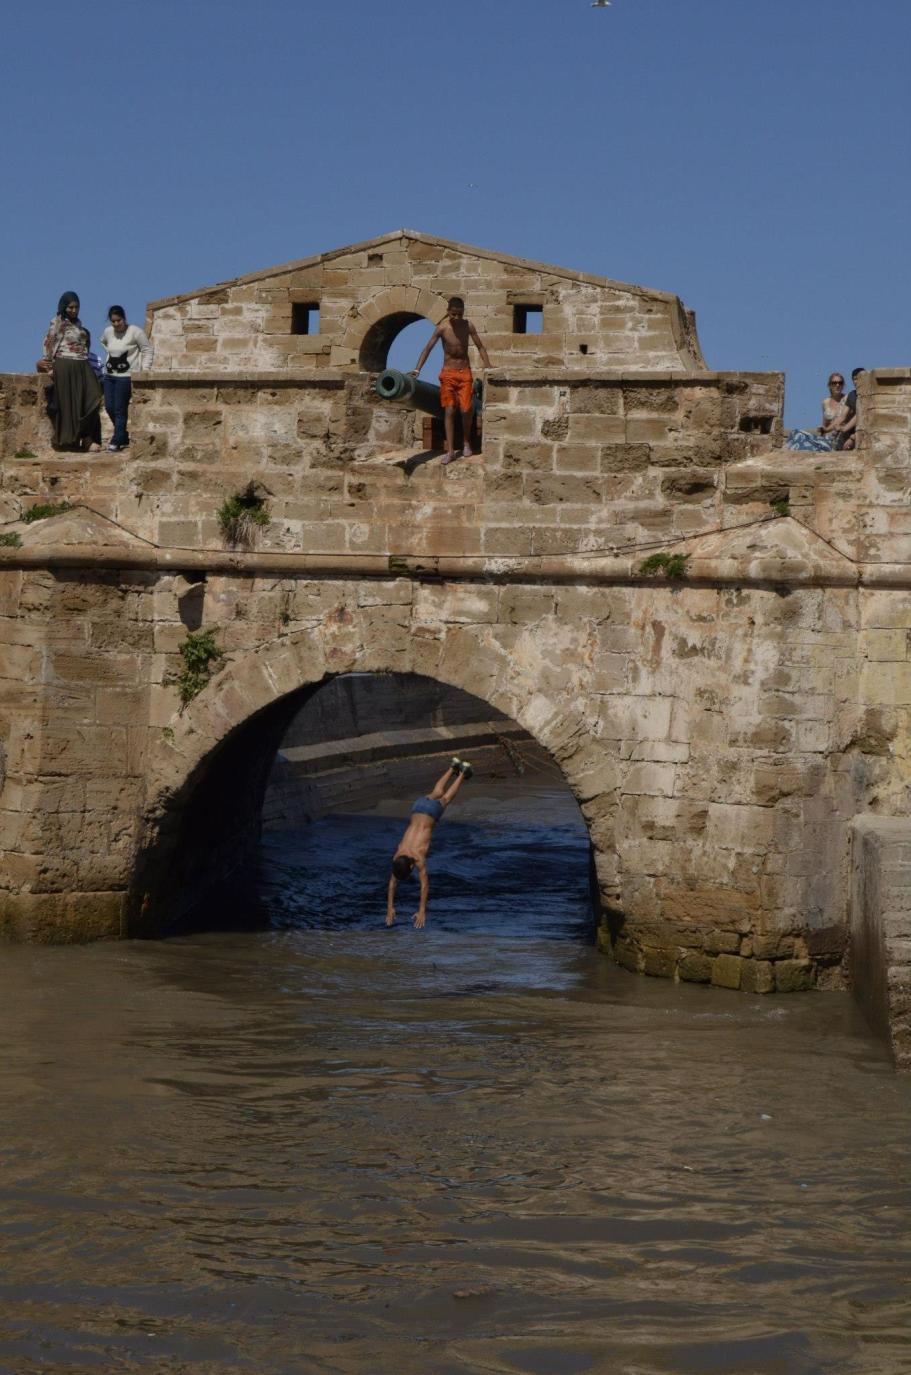 Niños lanzándose al agua.